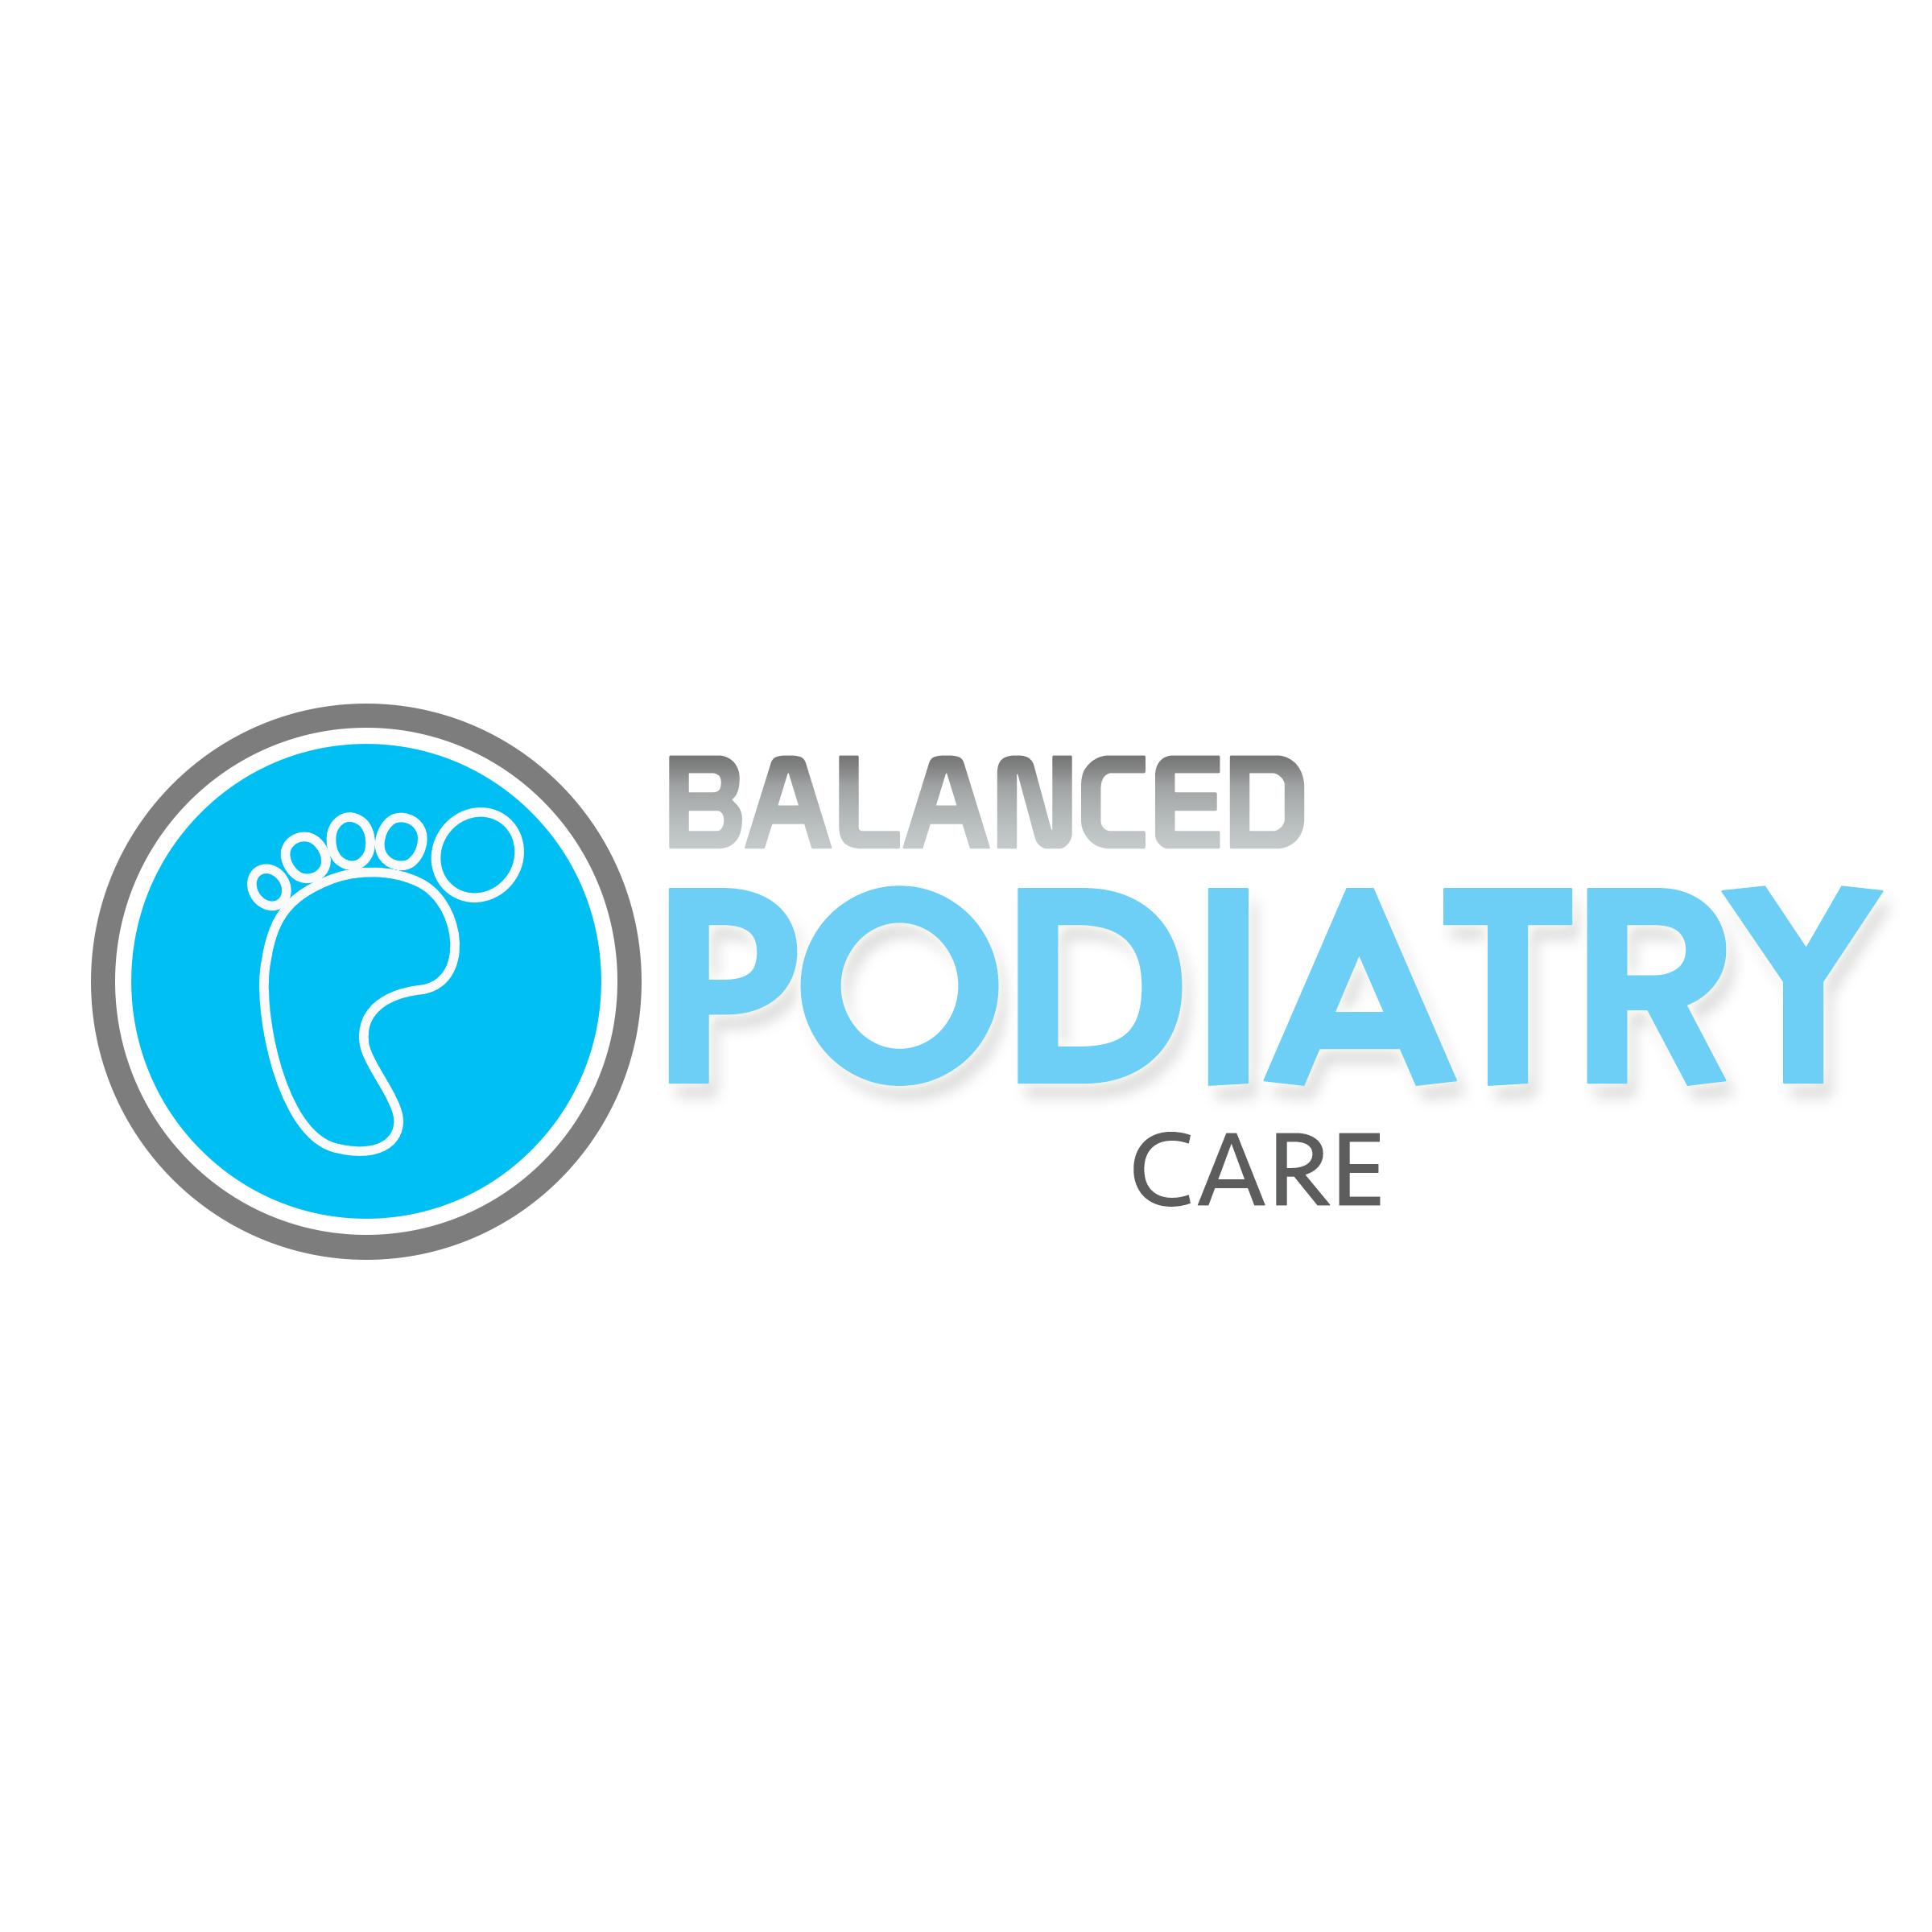 Balanced Podiatry Care